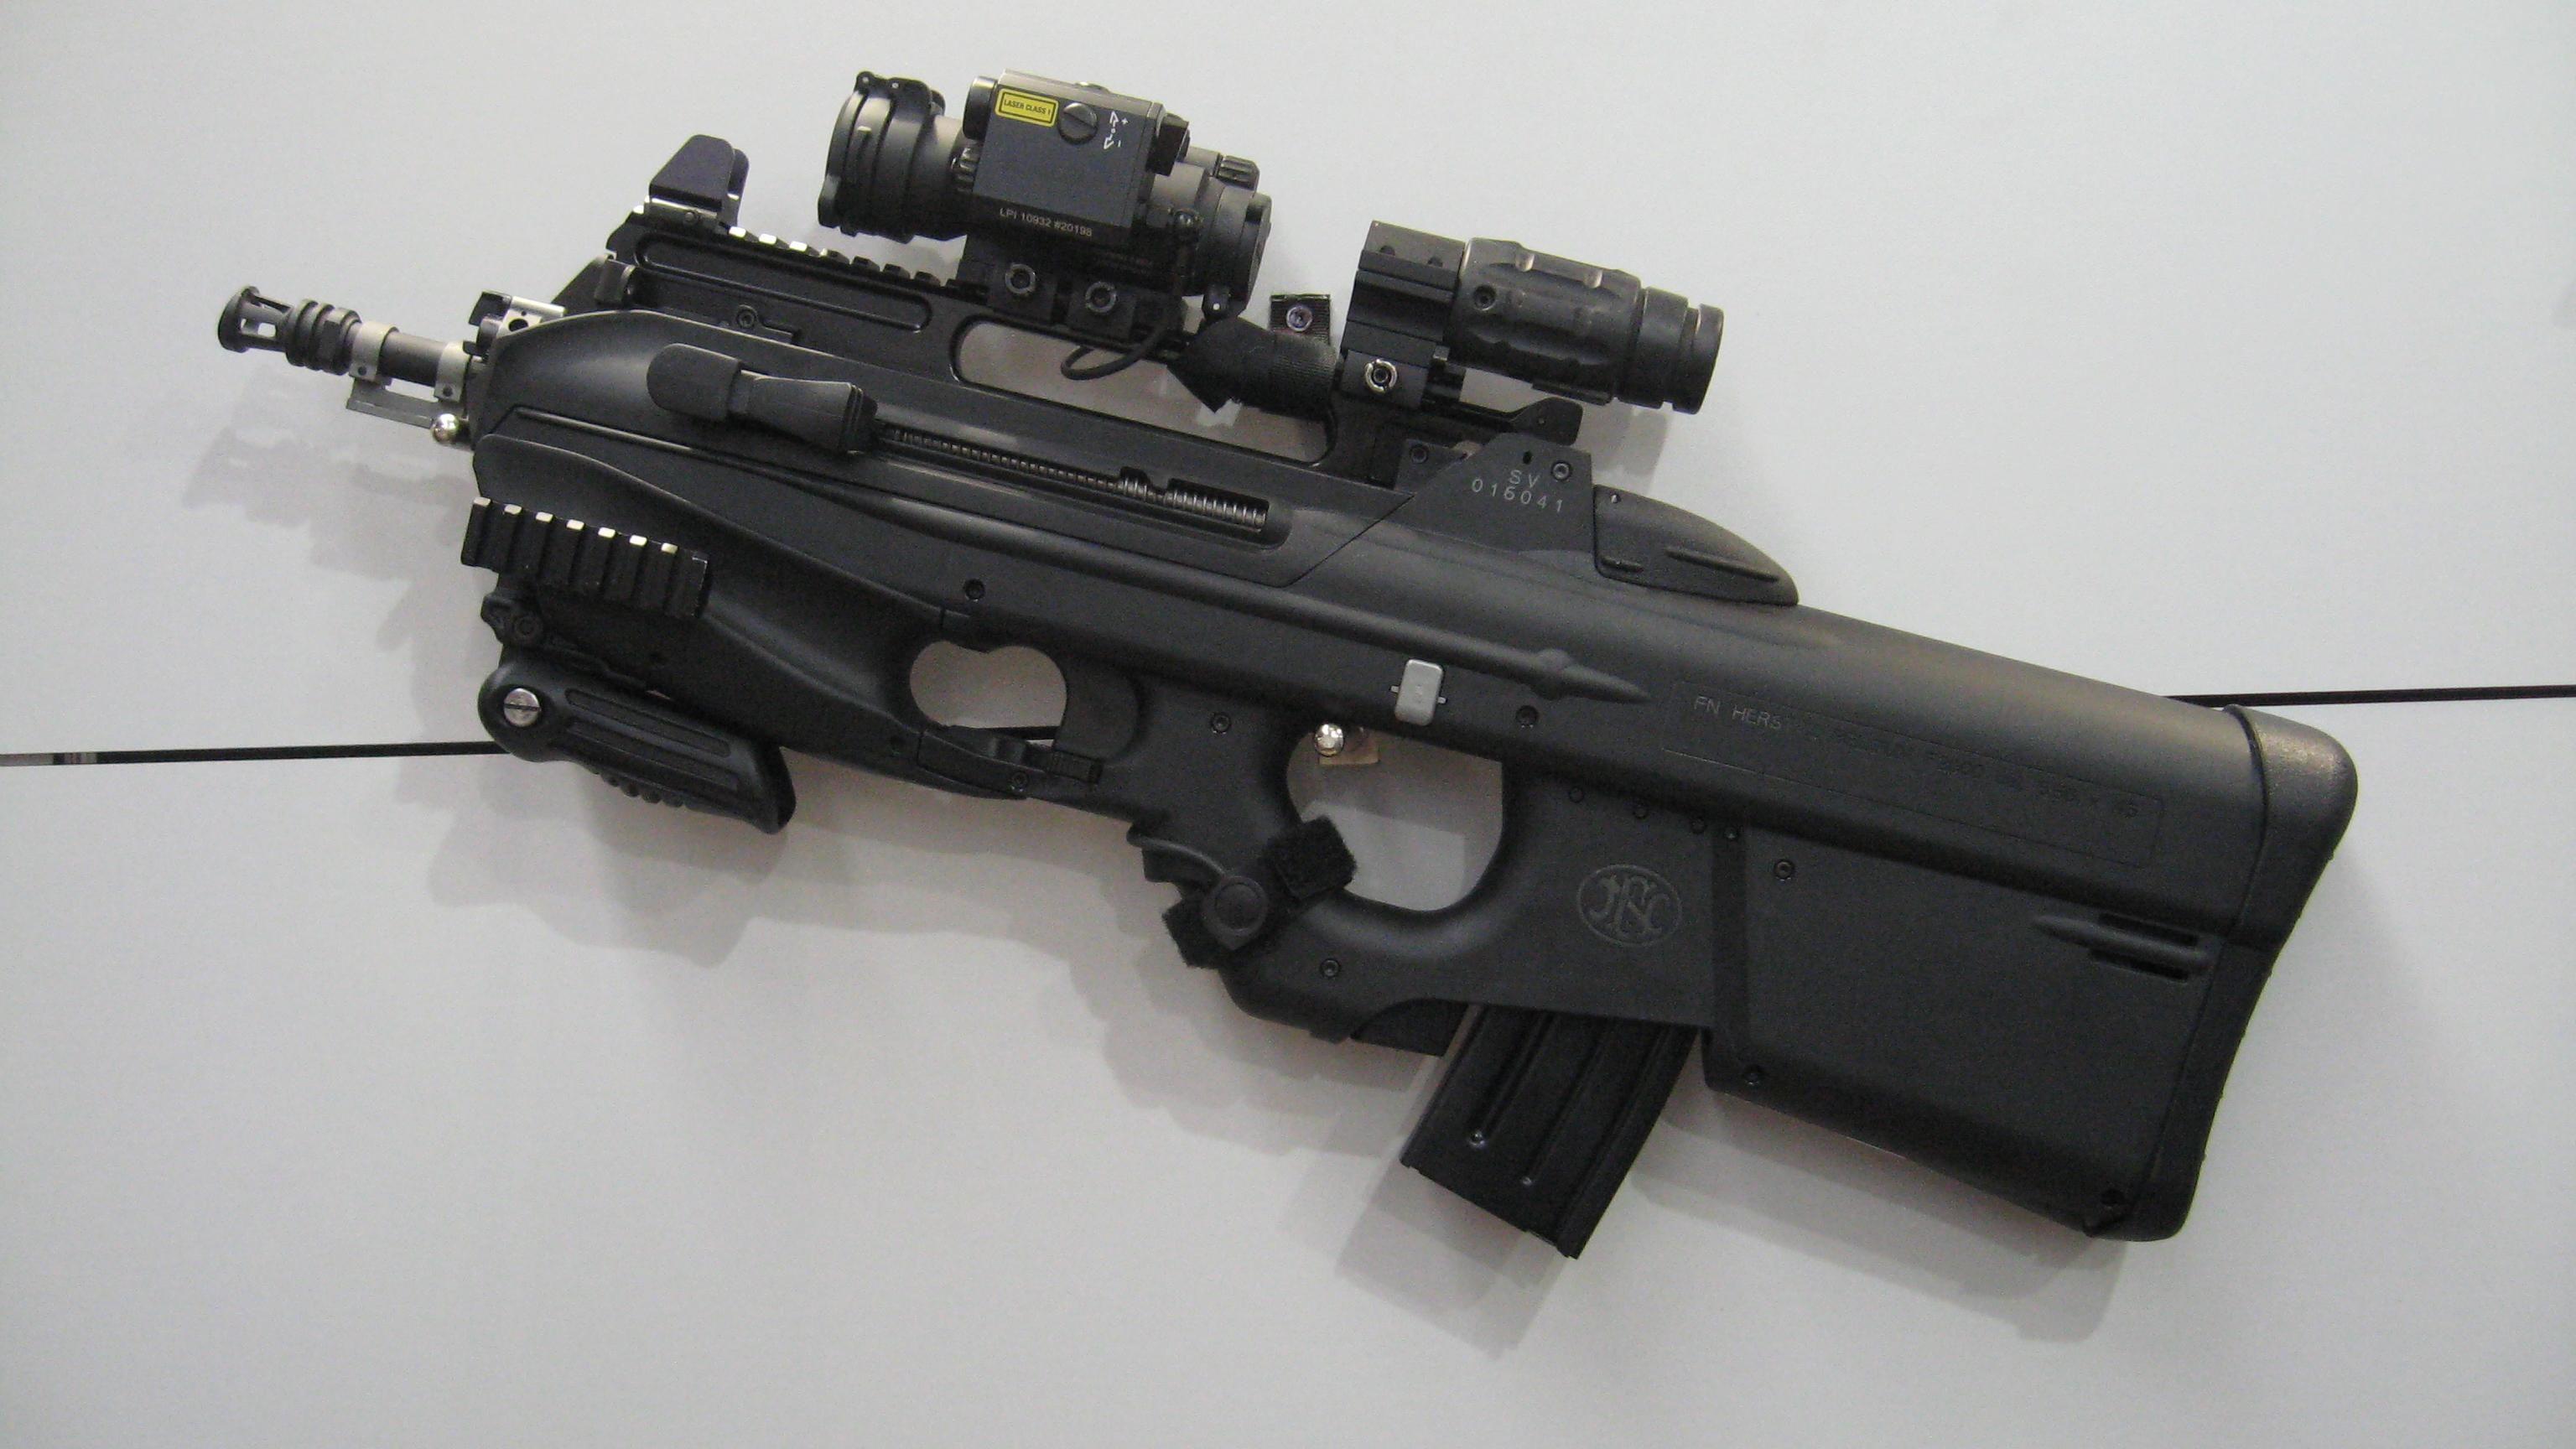 Top 10 Most Dangerous Guns in the World - Listotop